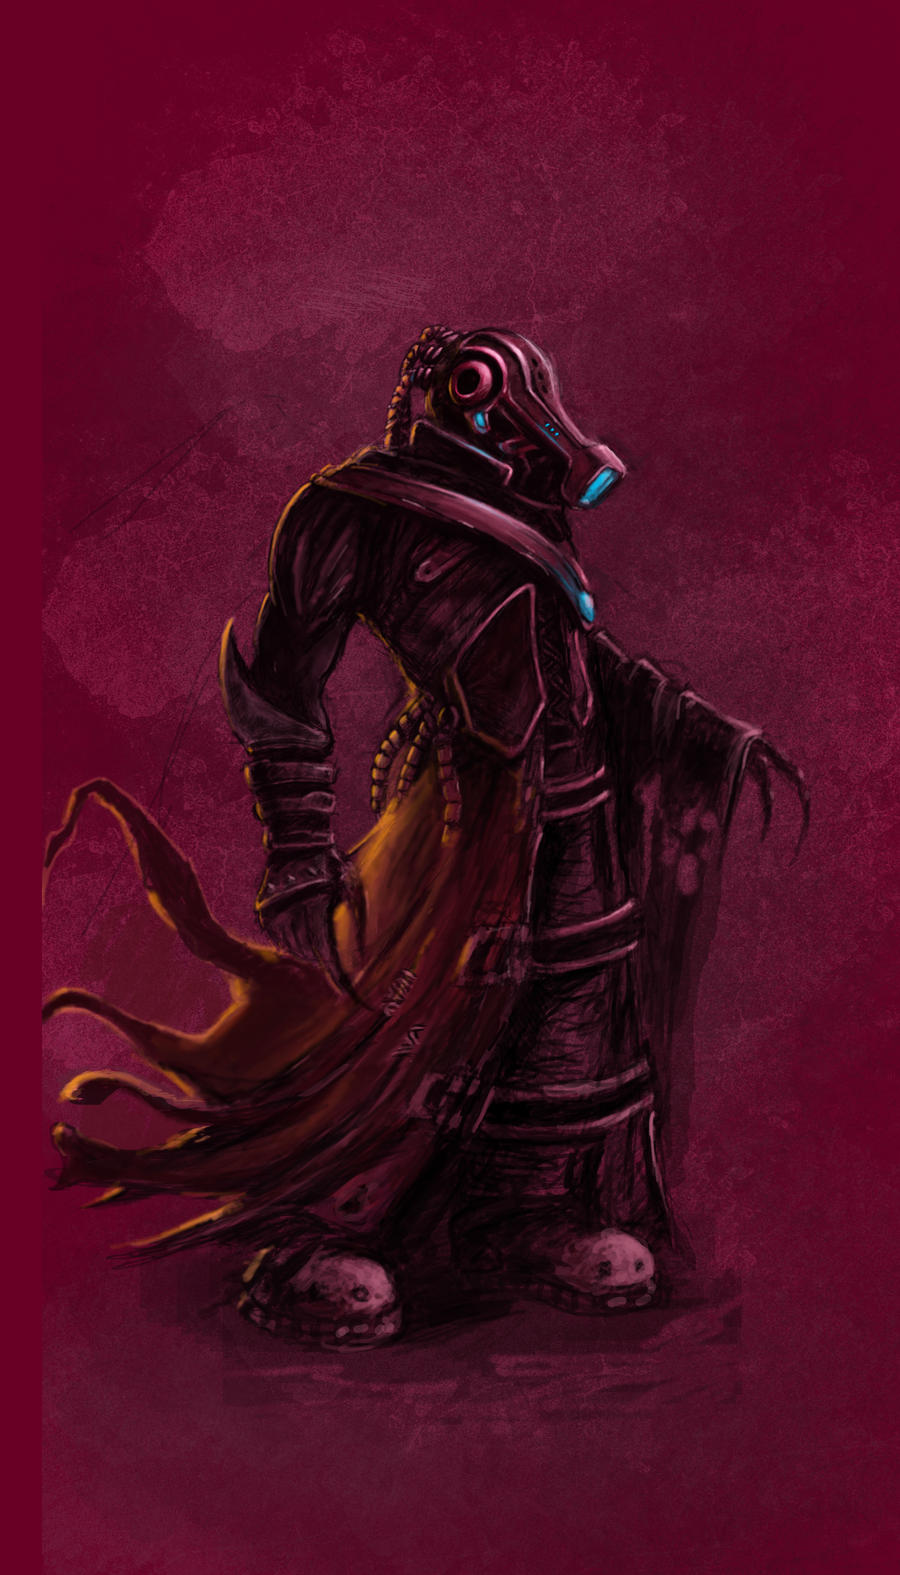 Darkness by Darkcloud013